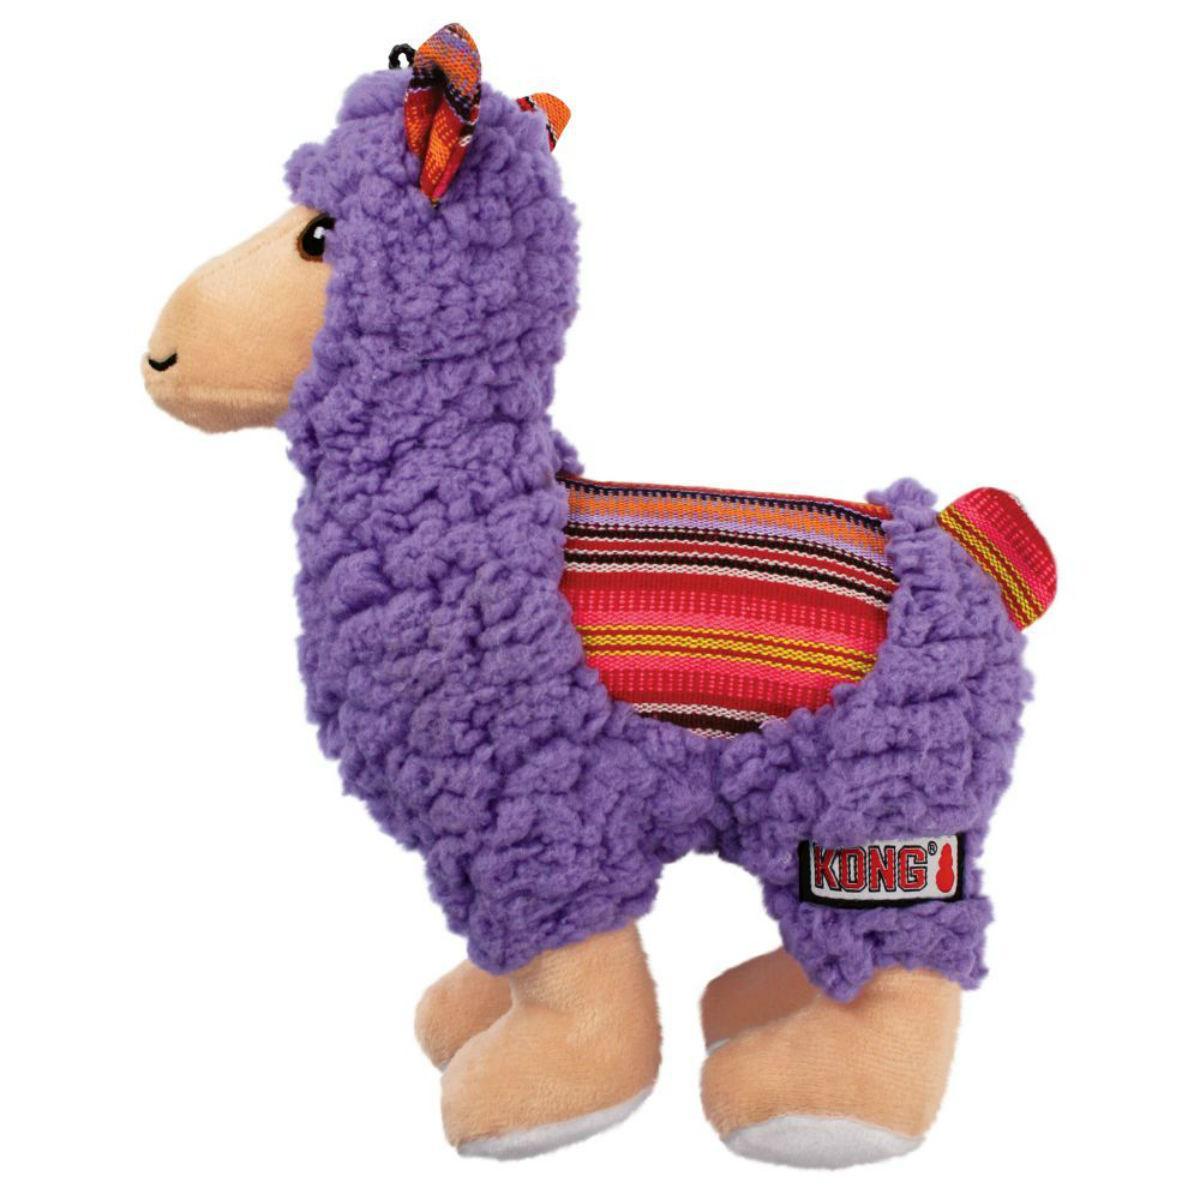 KONG Sherps Llama Dog Toy